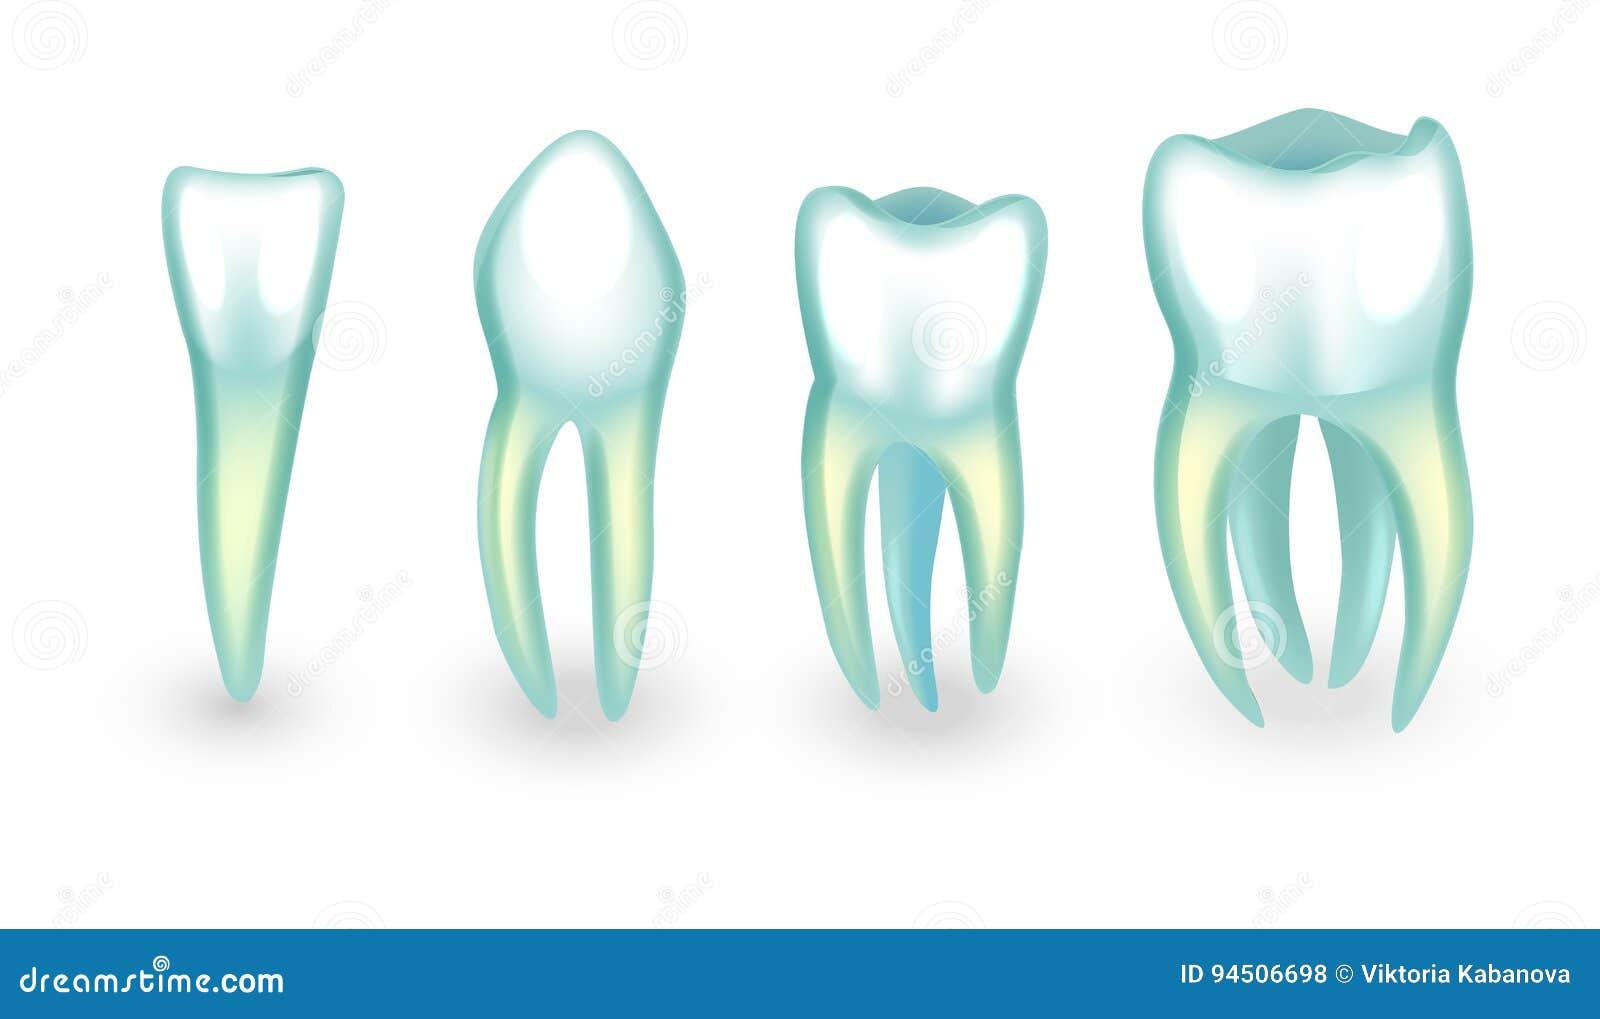 The Human Teeth Incisor Canine And Molarsb Stock Vector